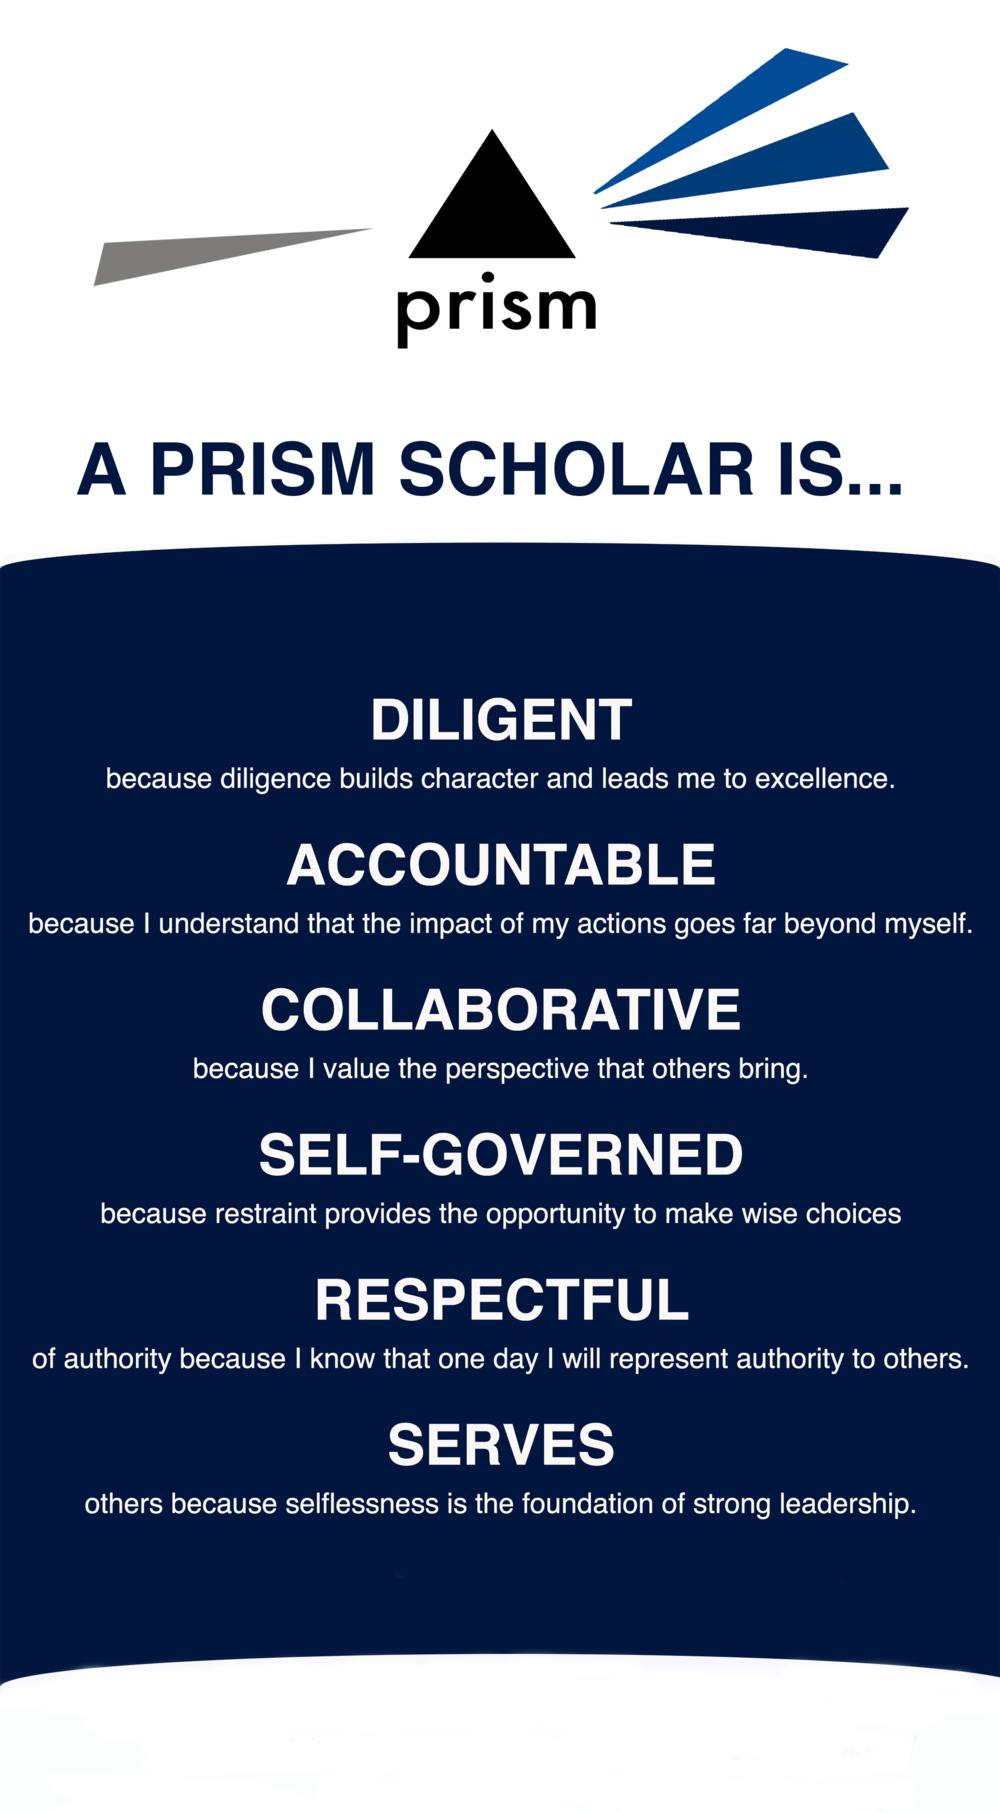 Prism_CreedBanner_3.png